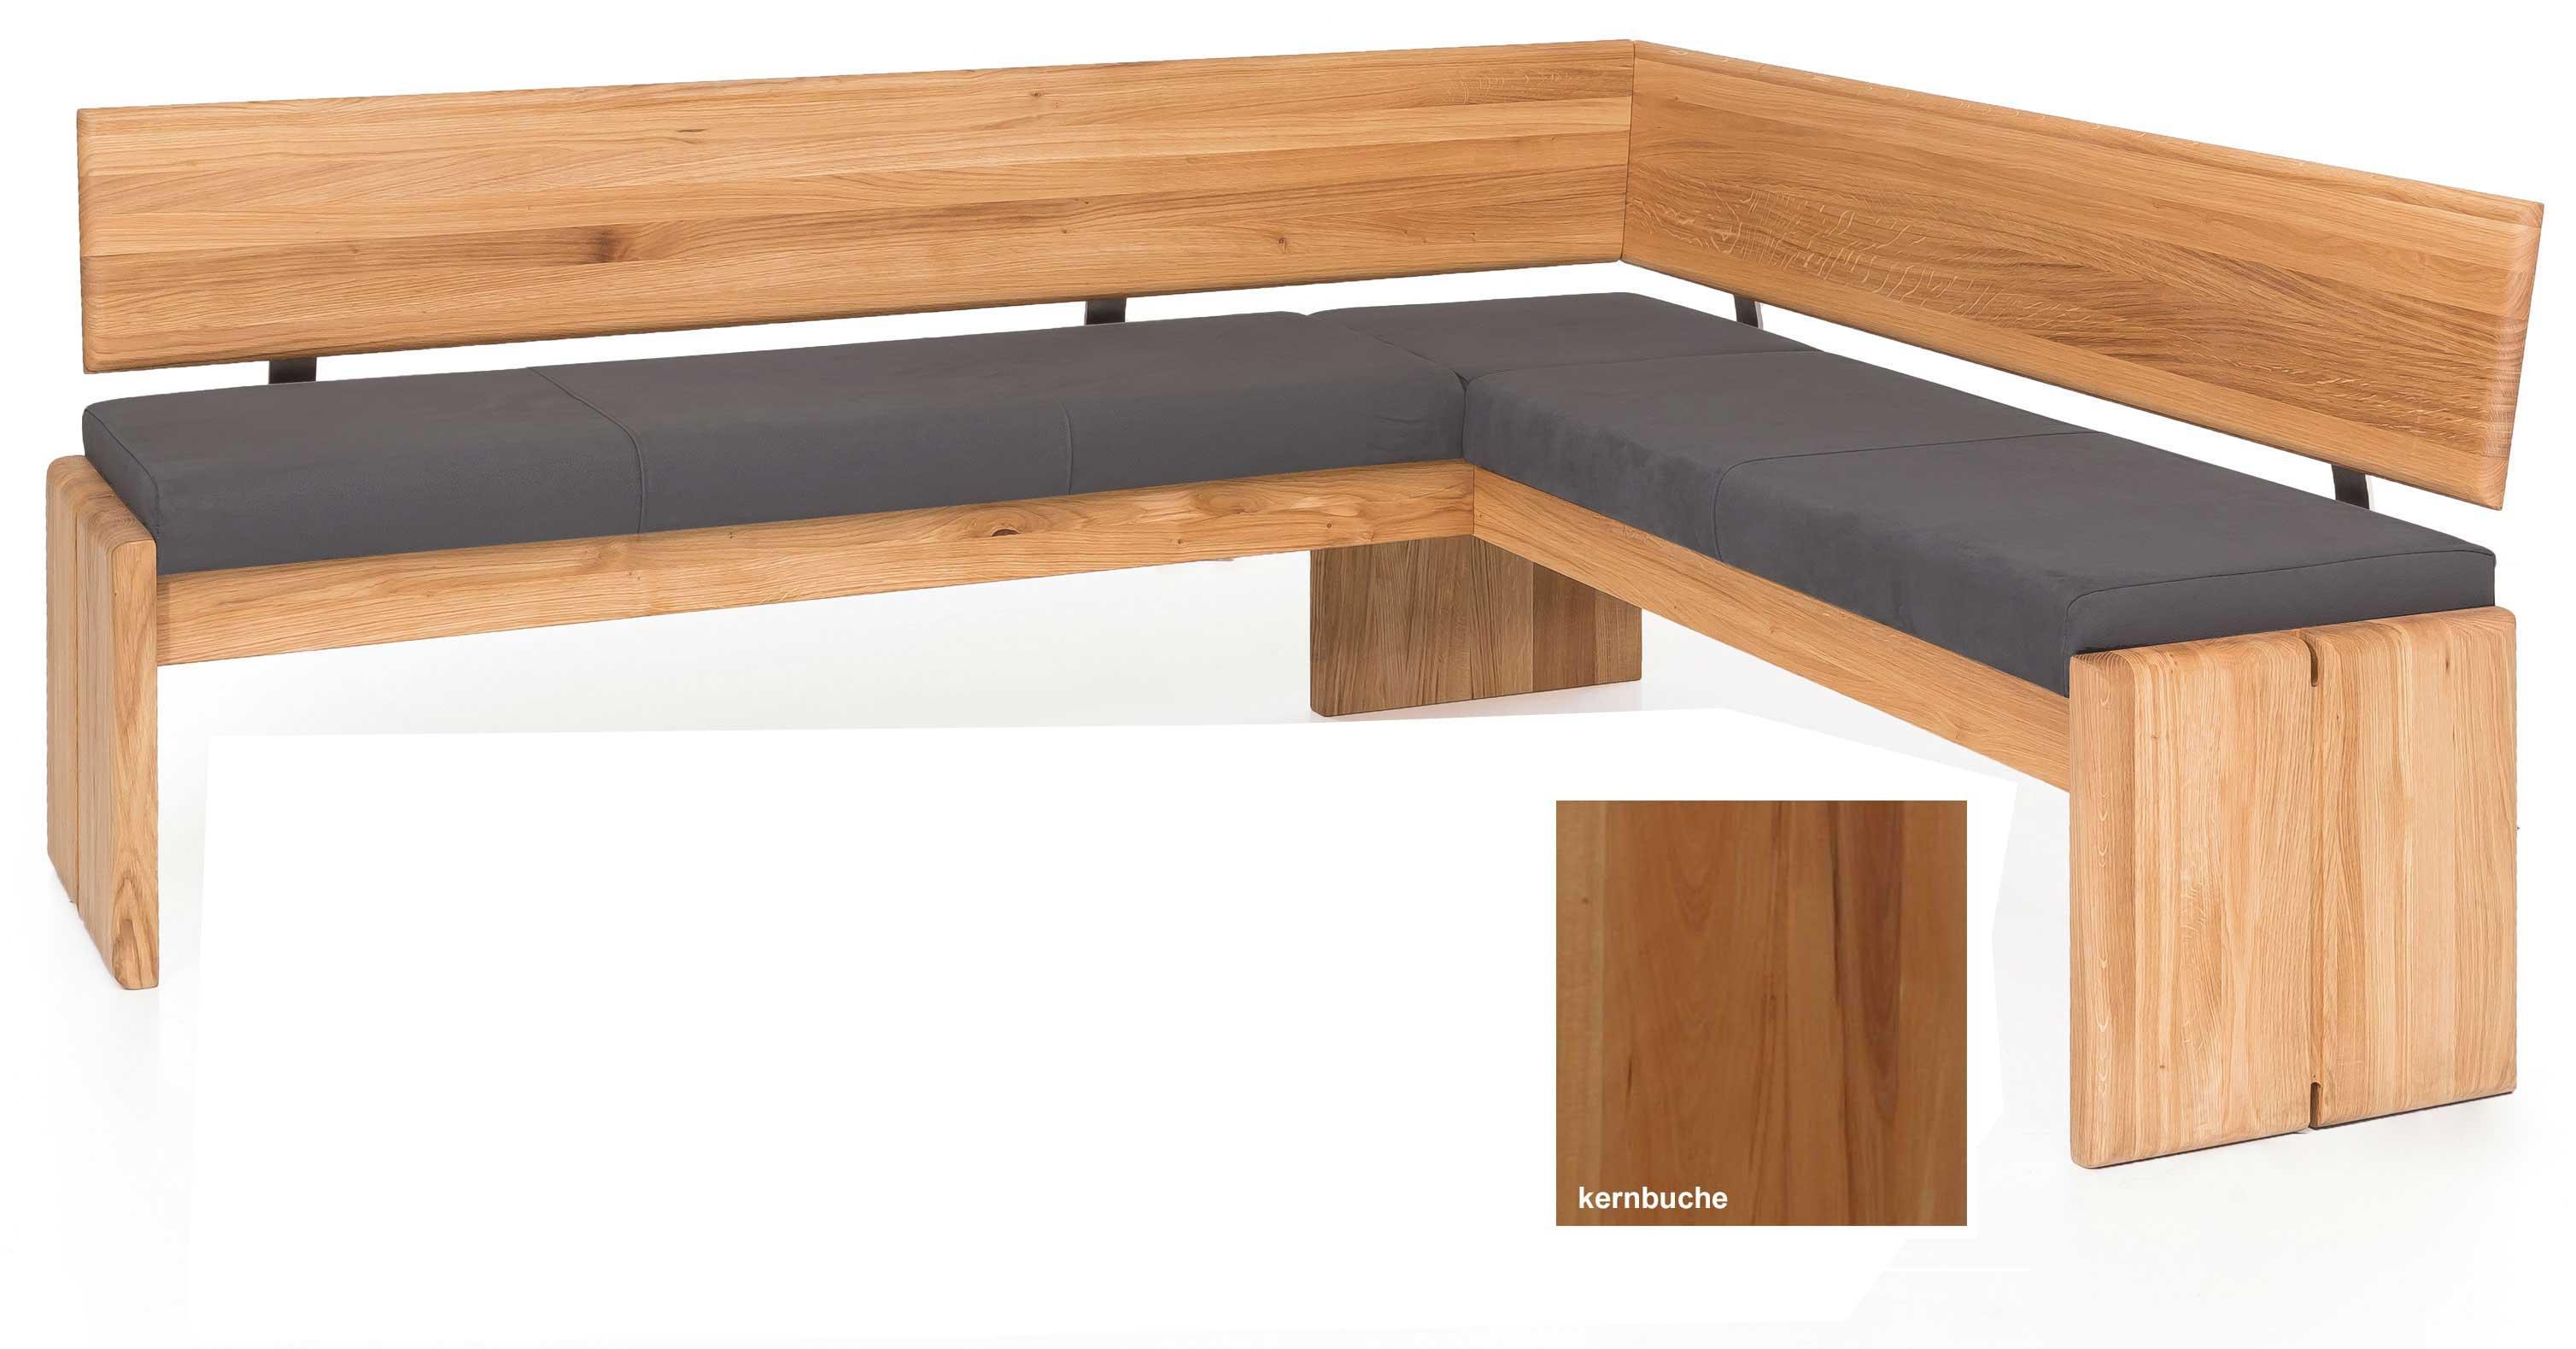 Standard Furniture Stockholm Eckbank klappbar massiv kernbuche mit Polster